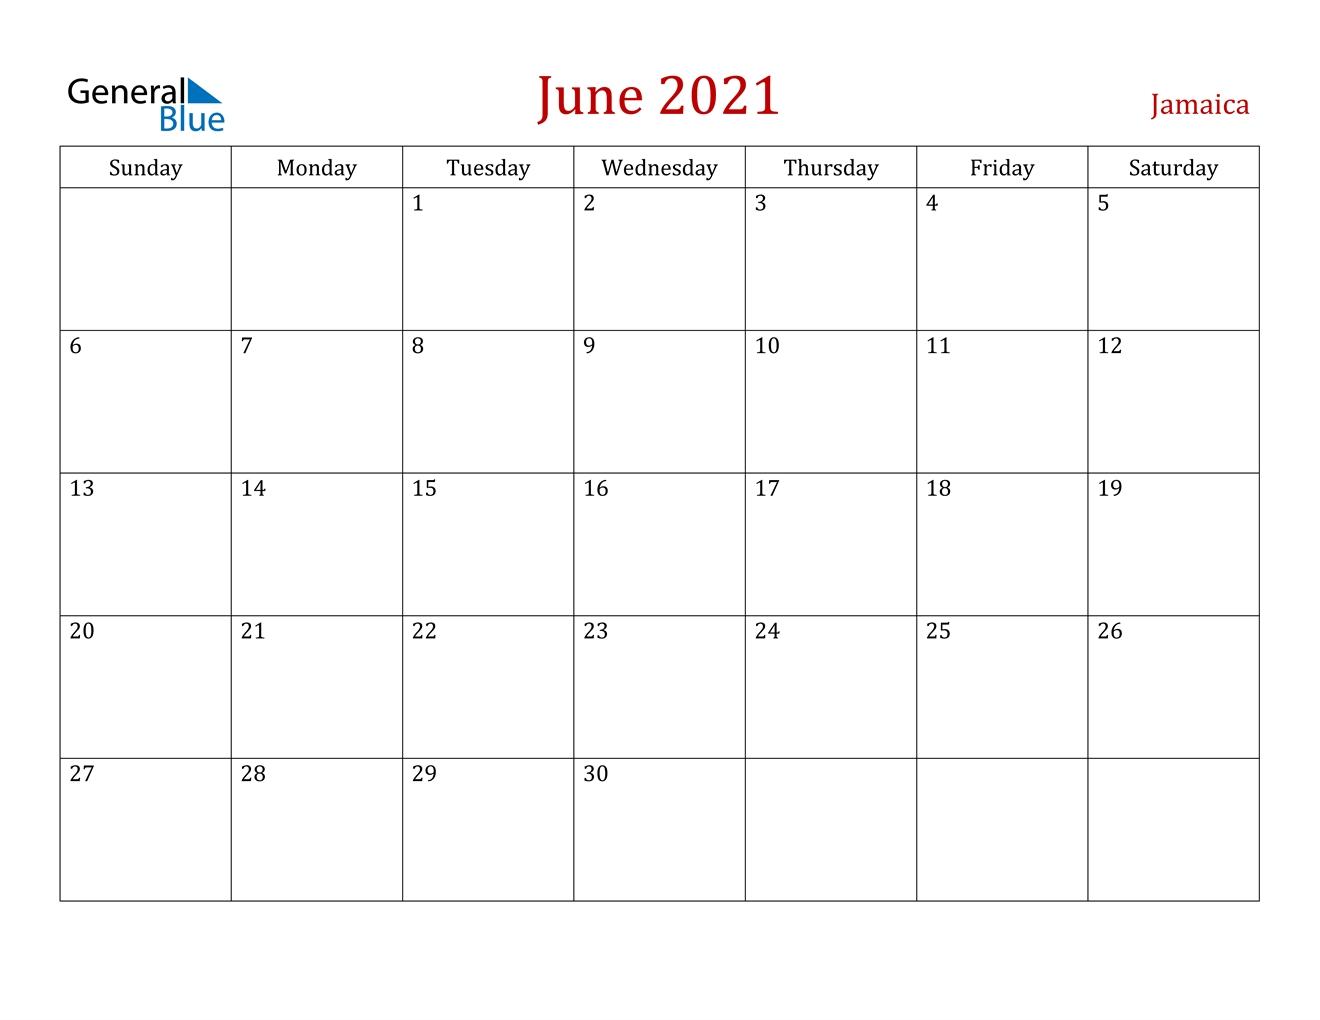 June 2021 Calendar - Jamaica June 2021 Fishing Calendar